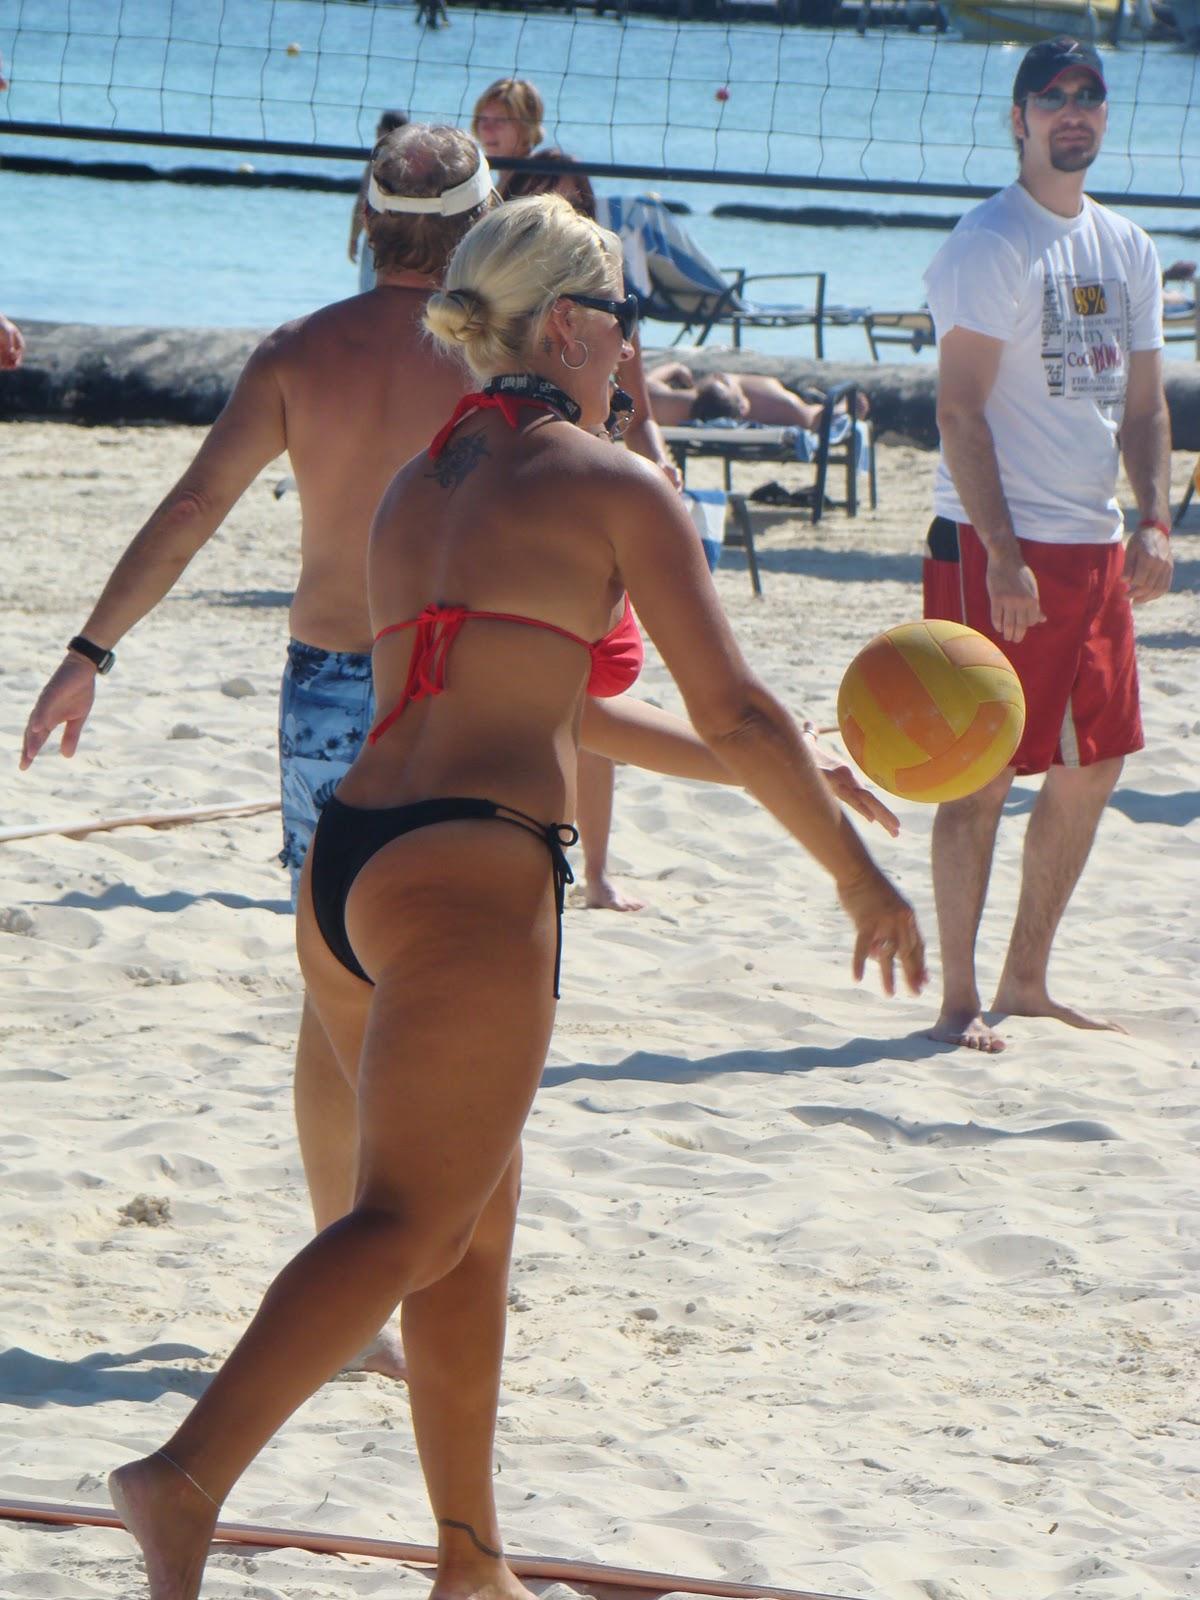 player bikini Volleyball hot